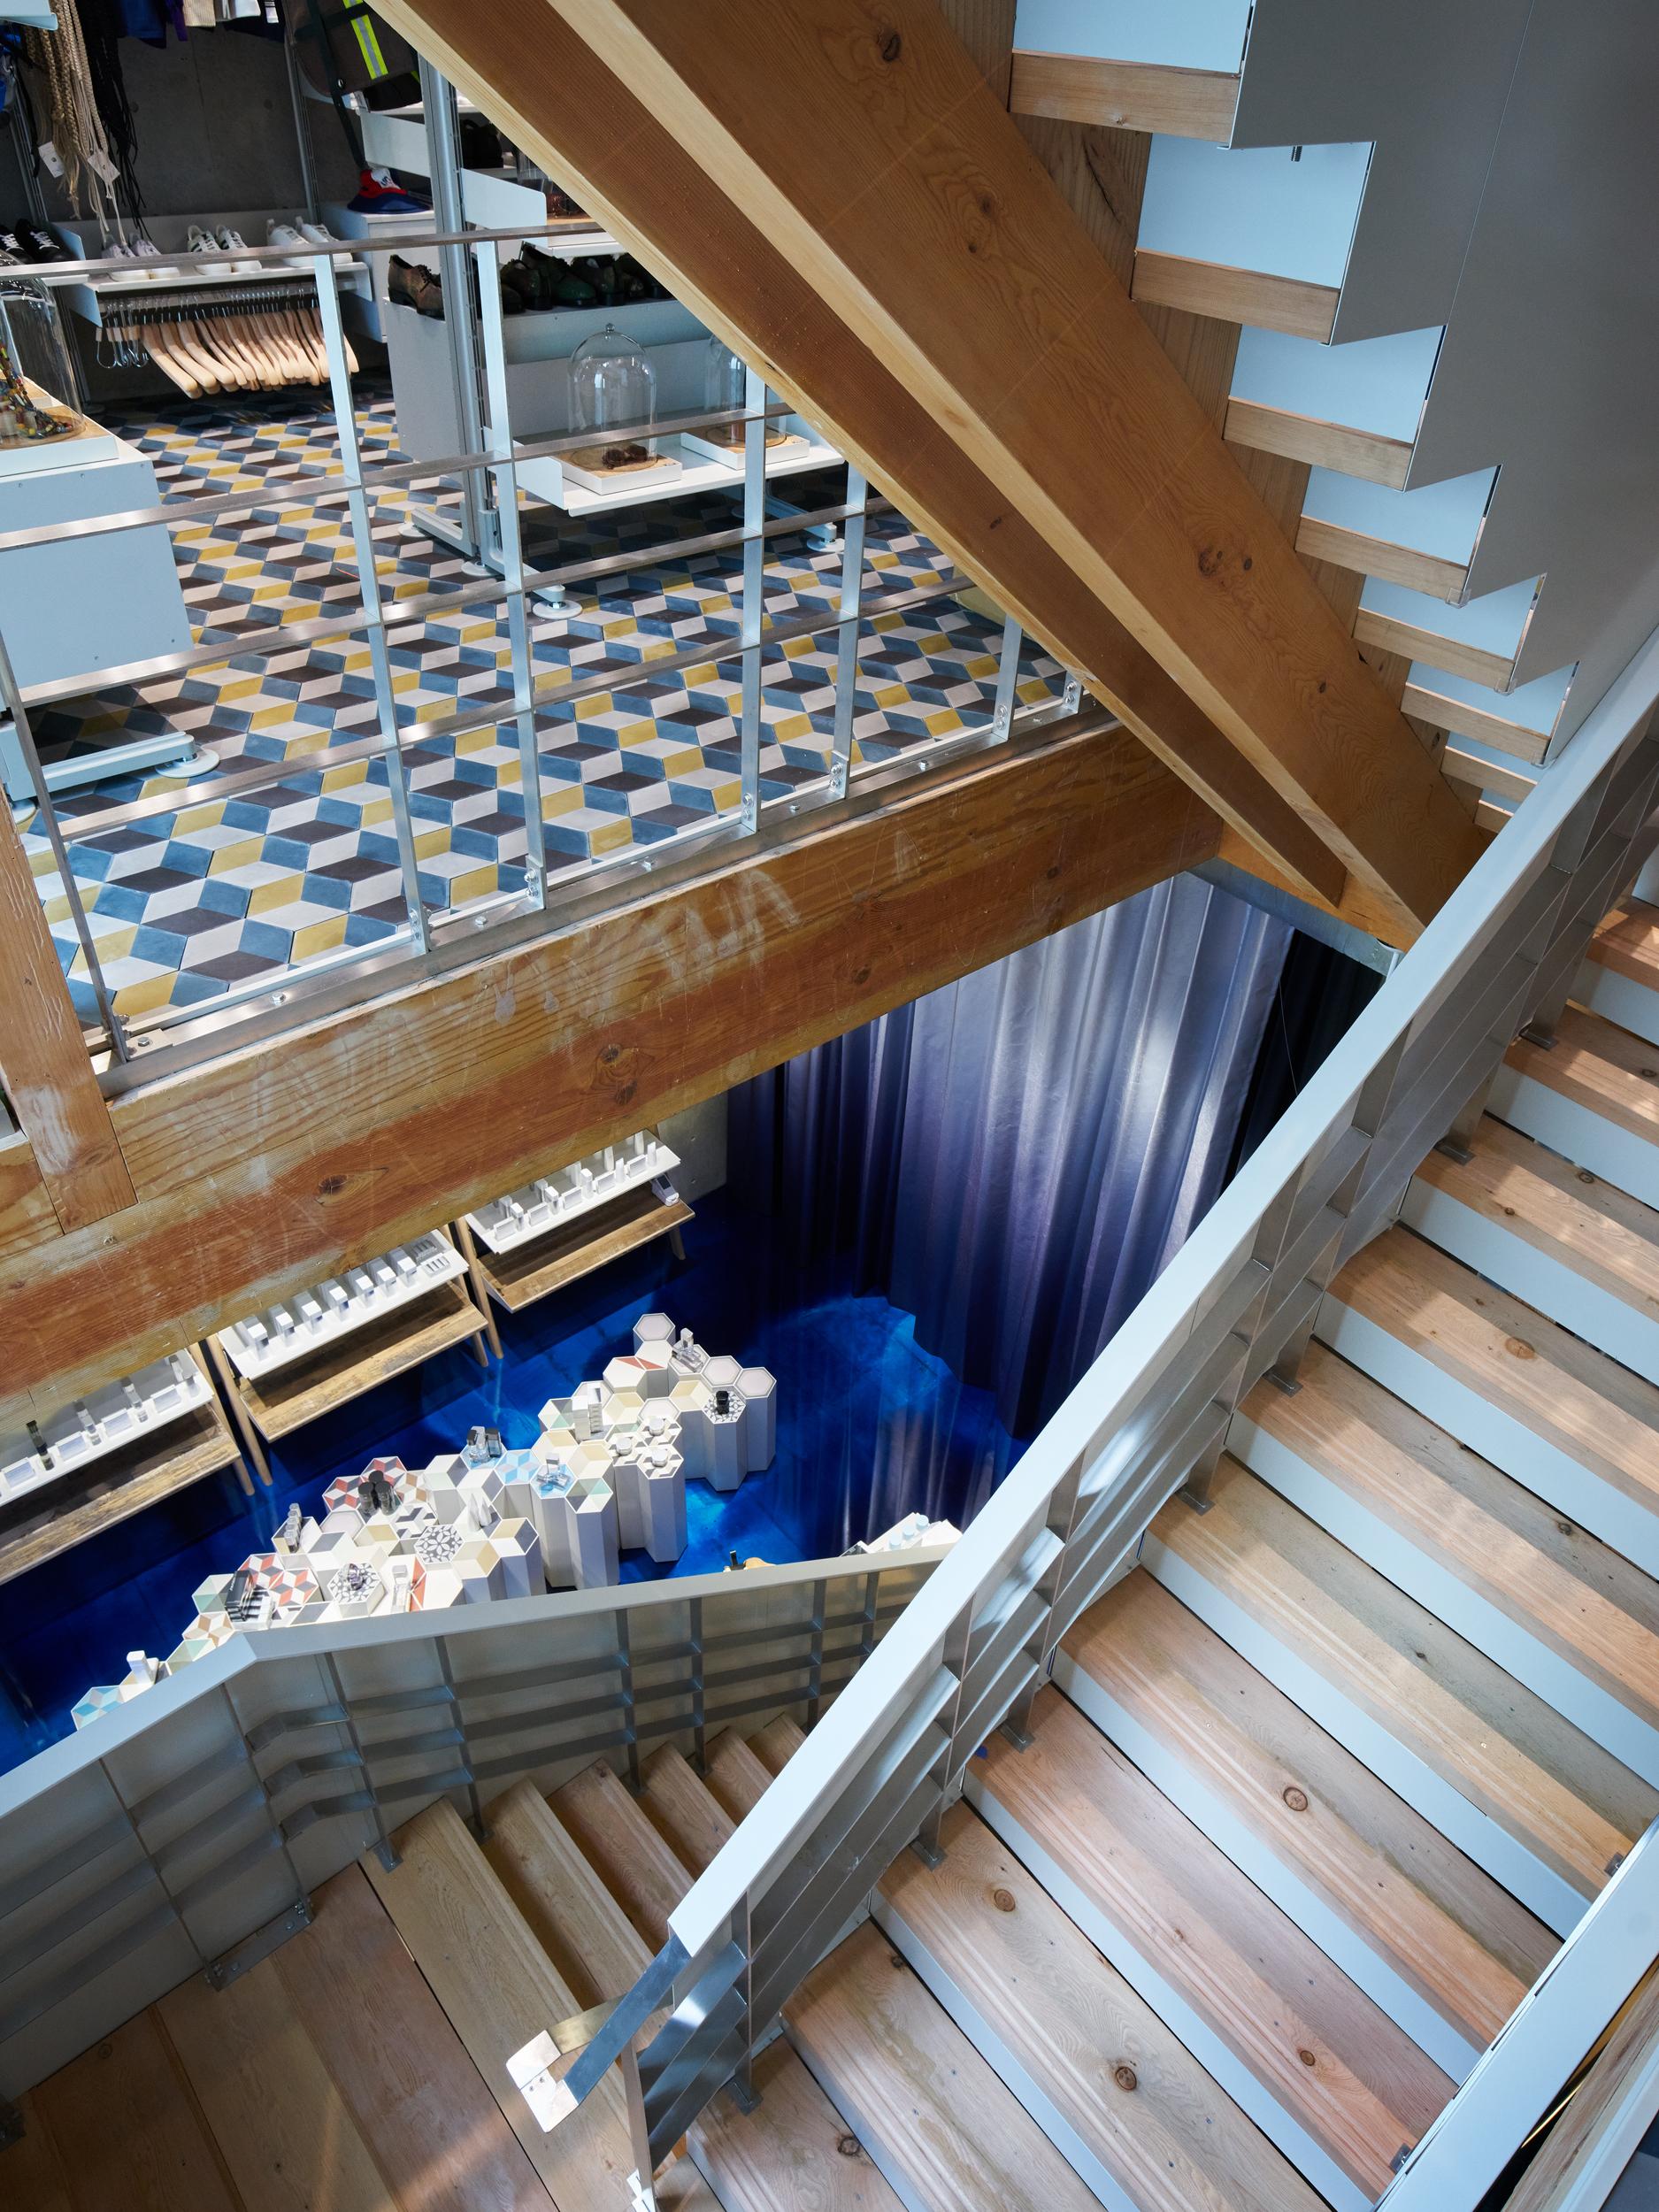 14_Cut Architectures_ l Echoppe Tokyo09 Copyright David foessel.jpg